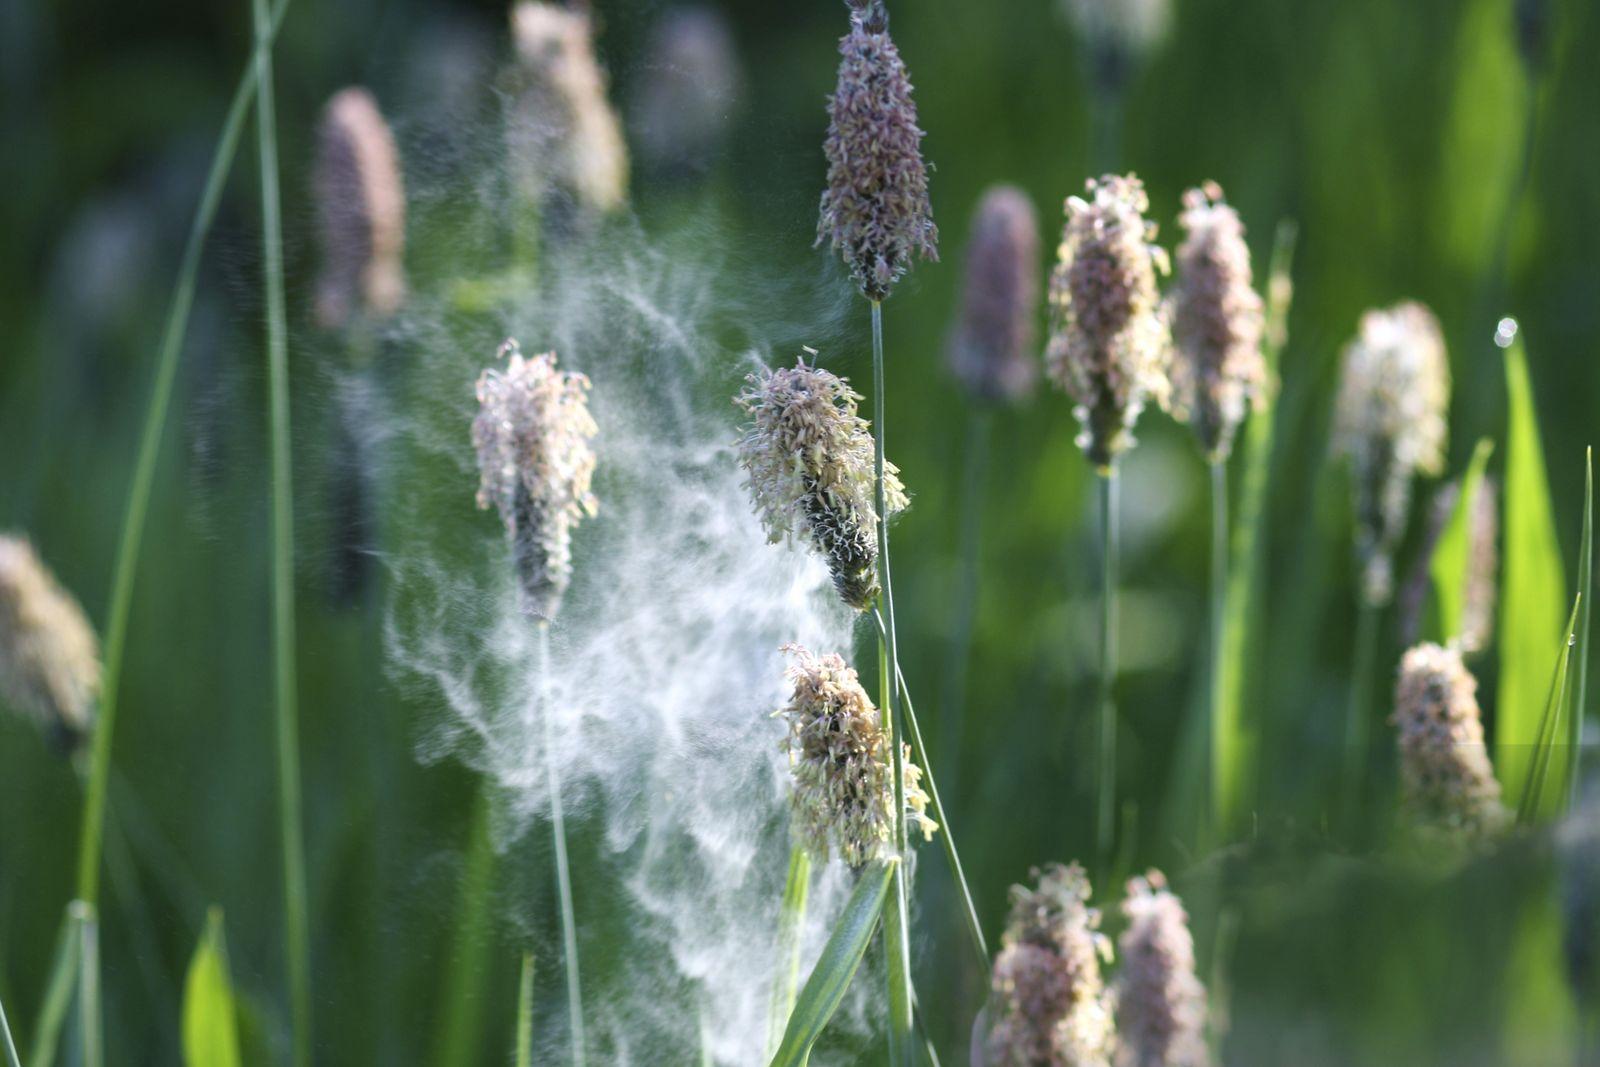 Pollenflug eines Grases, flying pollen of a grass